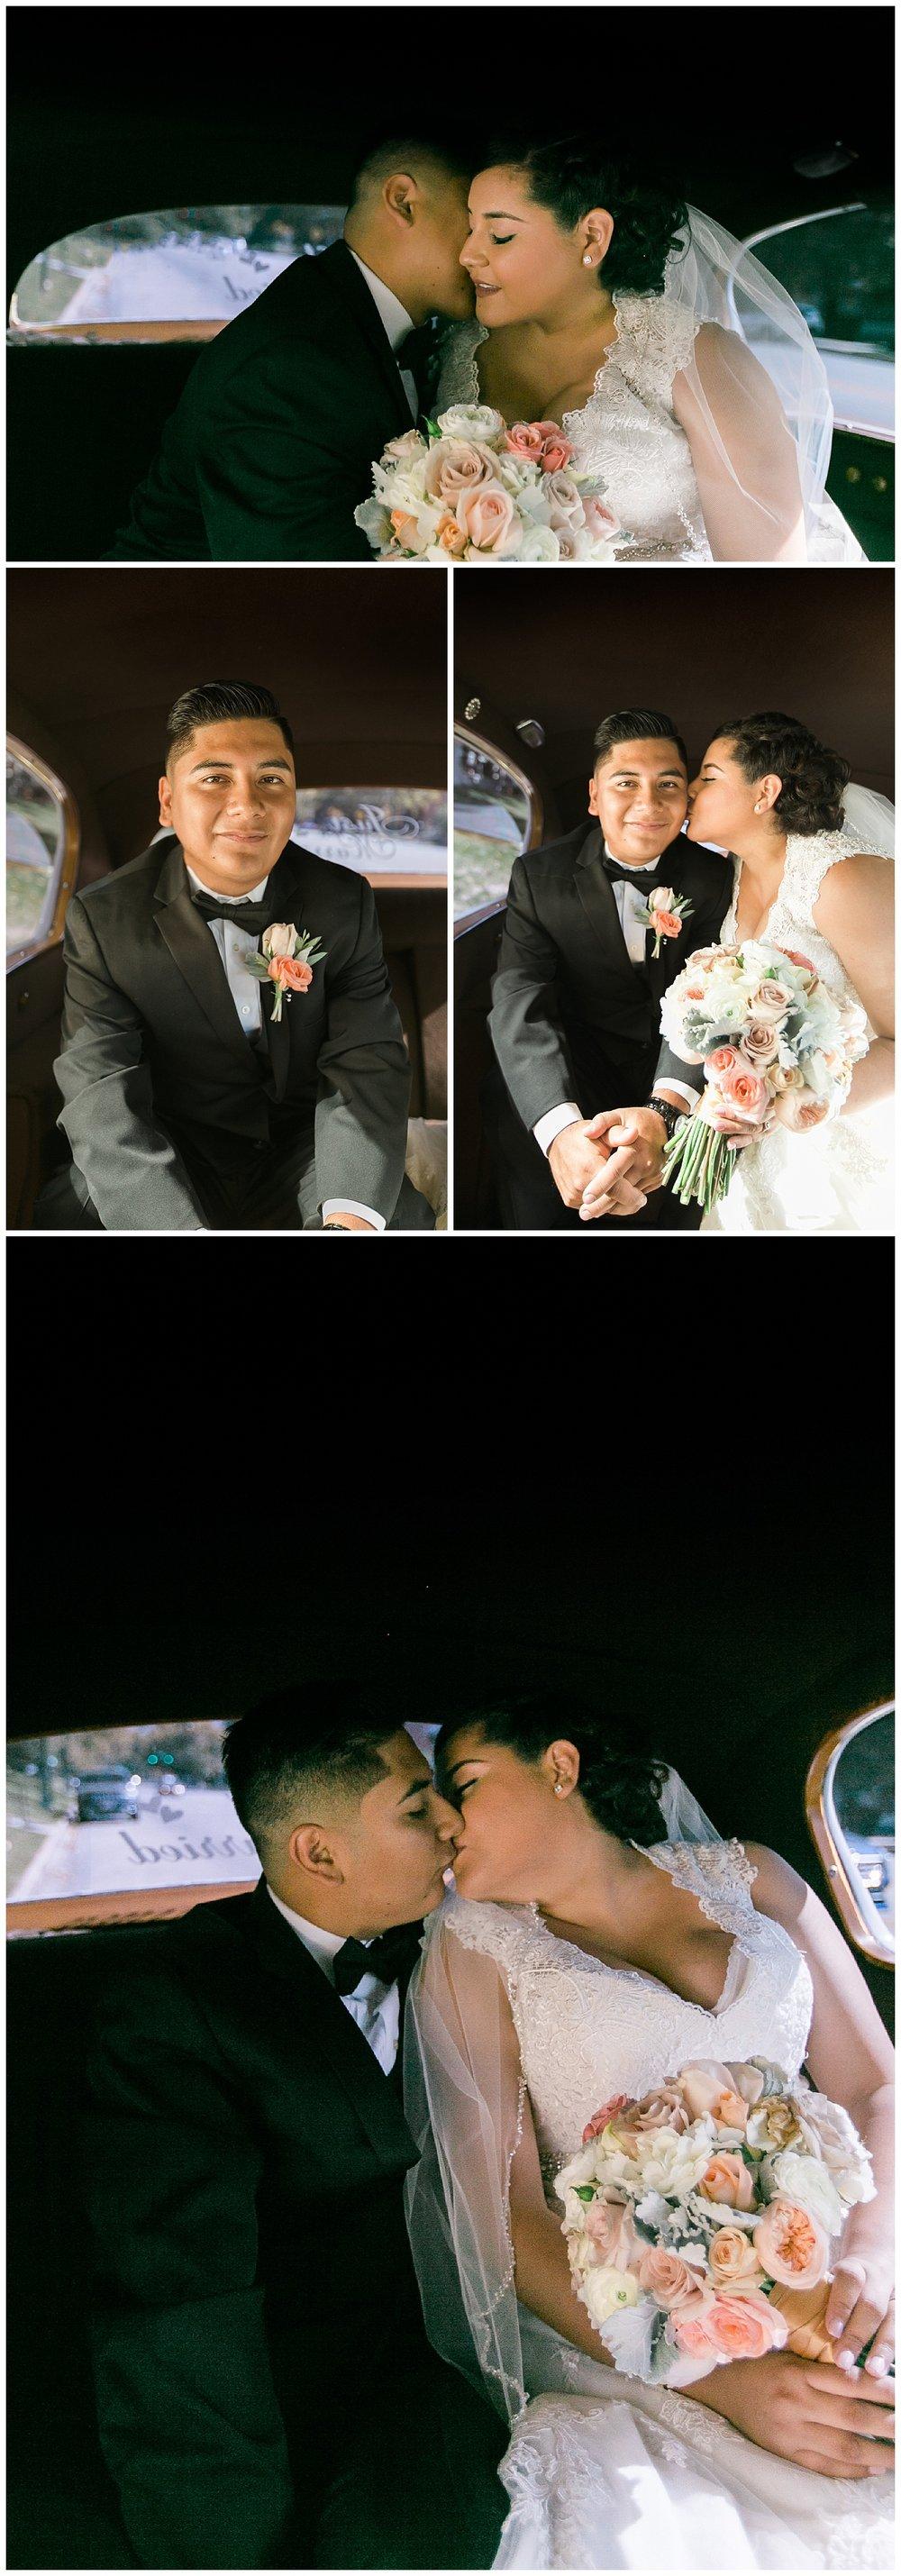 Utah Wedding Photographer Elia & Erik 2